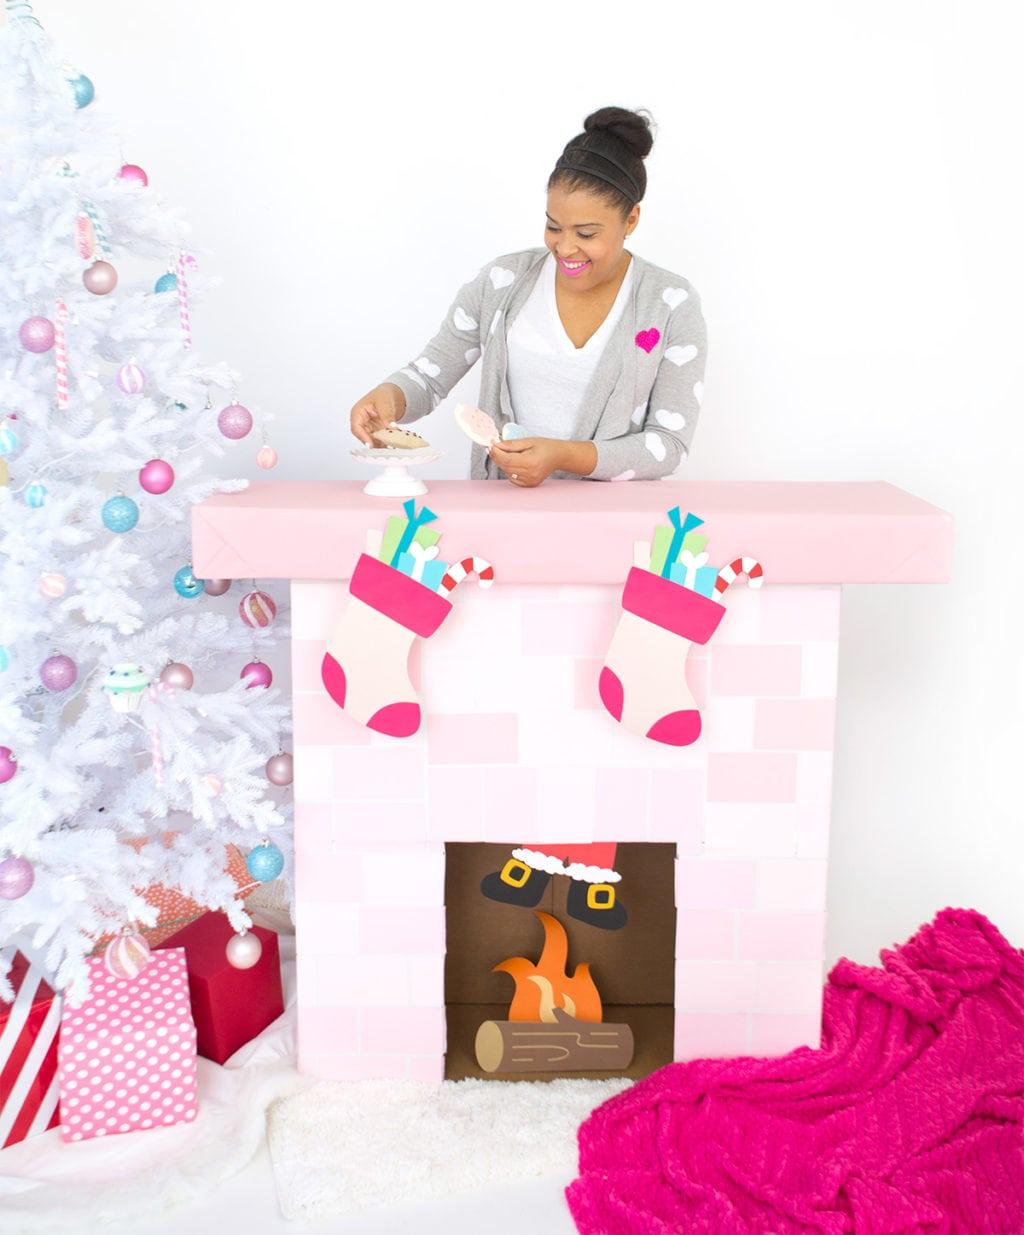 DIY pink cardboard fireplace for fun decor